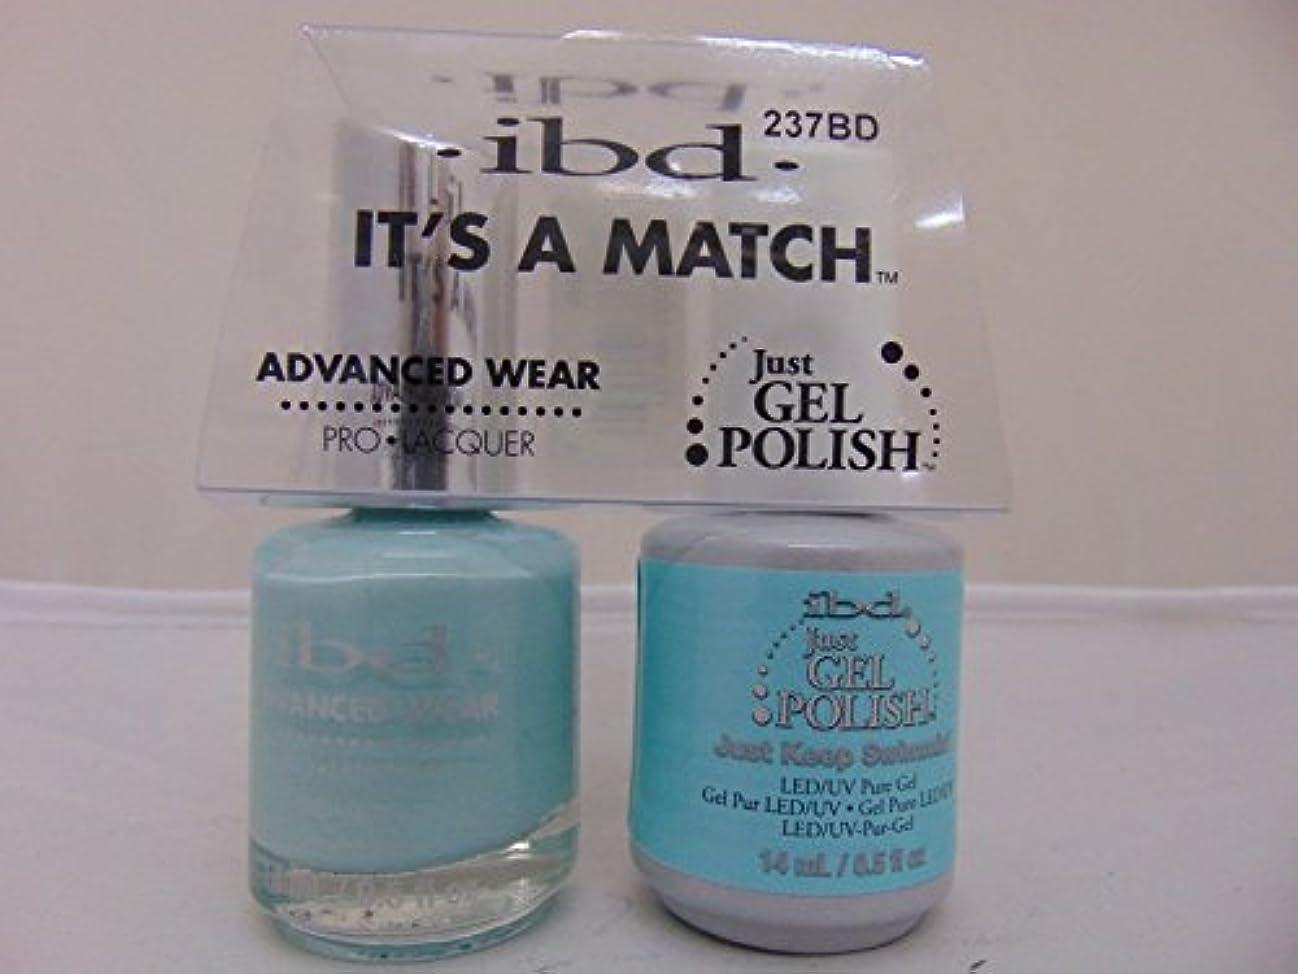 ibd - It's A Match -Duo Pack- Just Keep Swimmin' - 14 mL / 0.5 oz Each